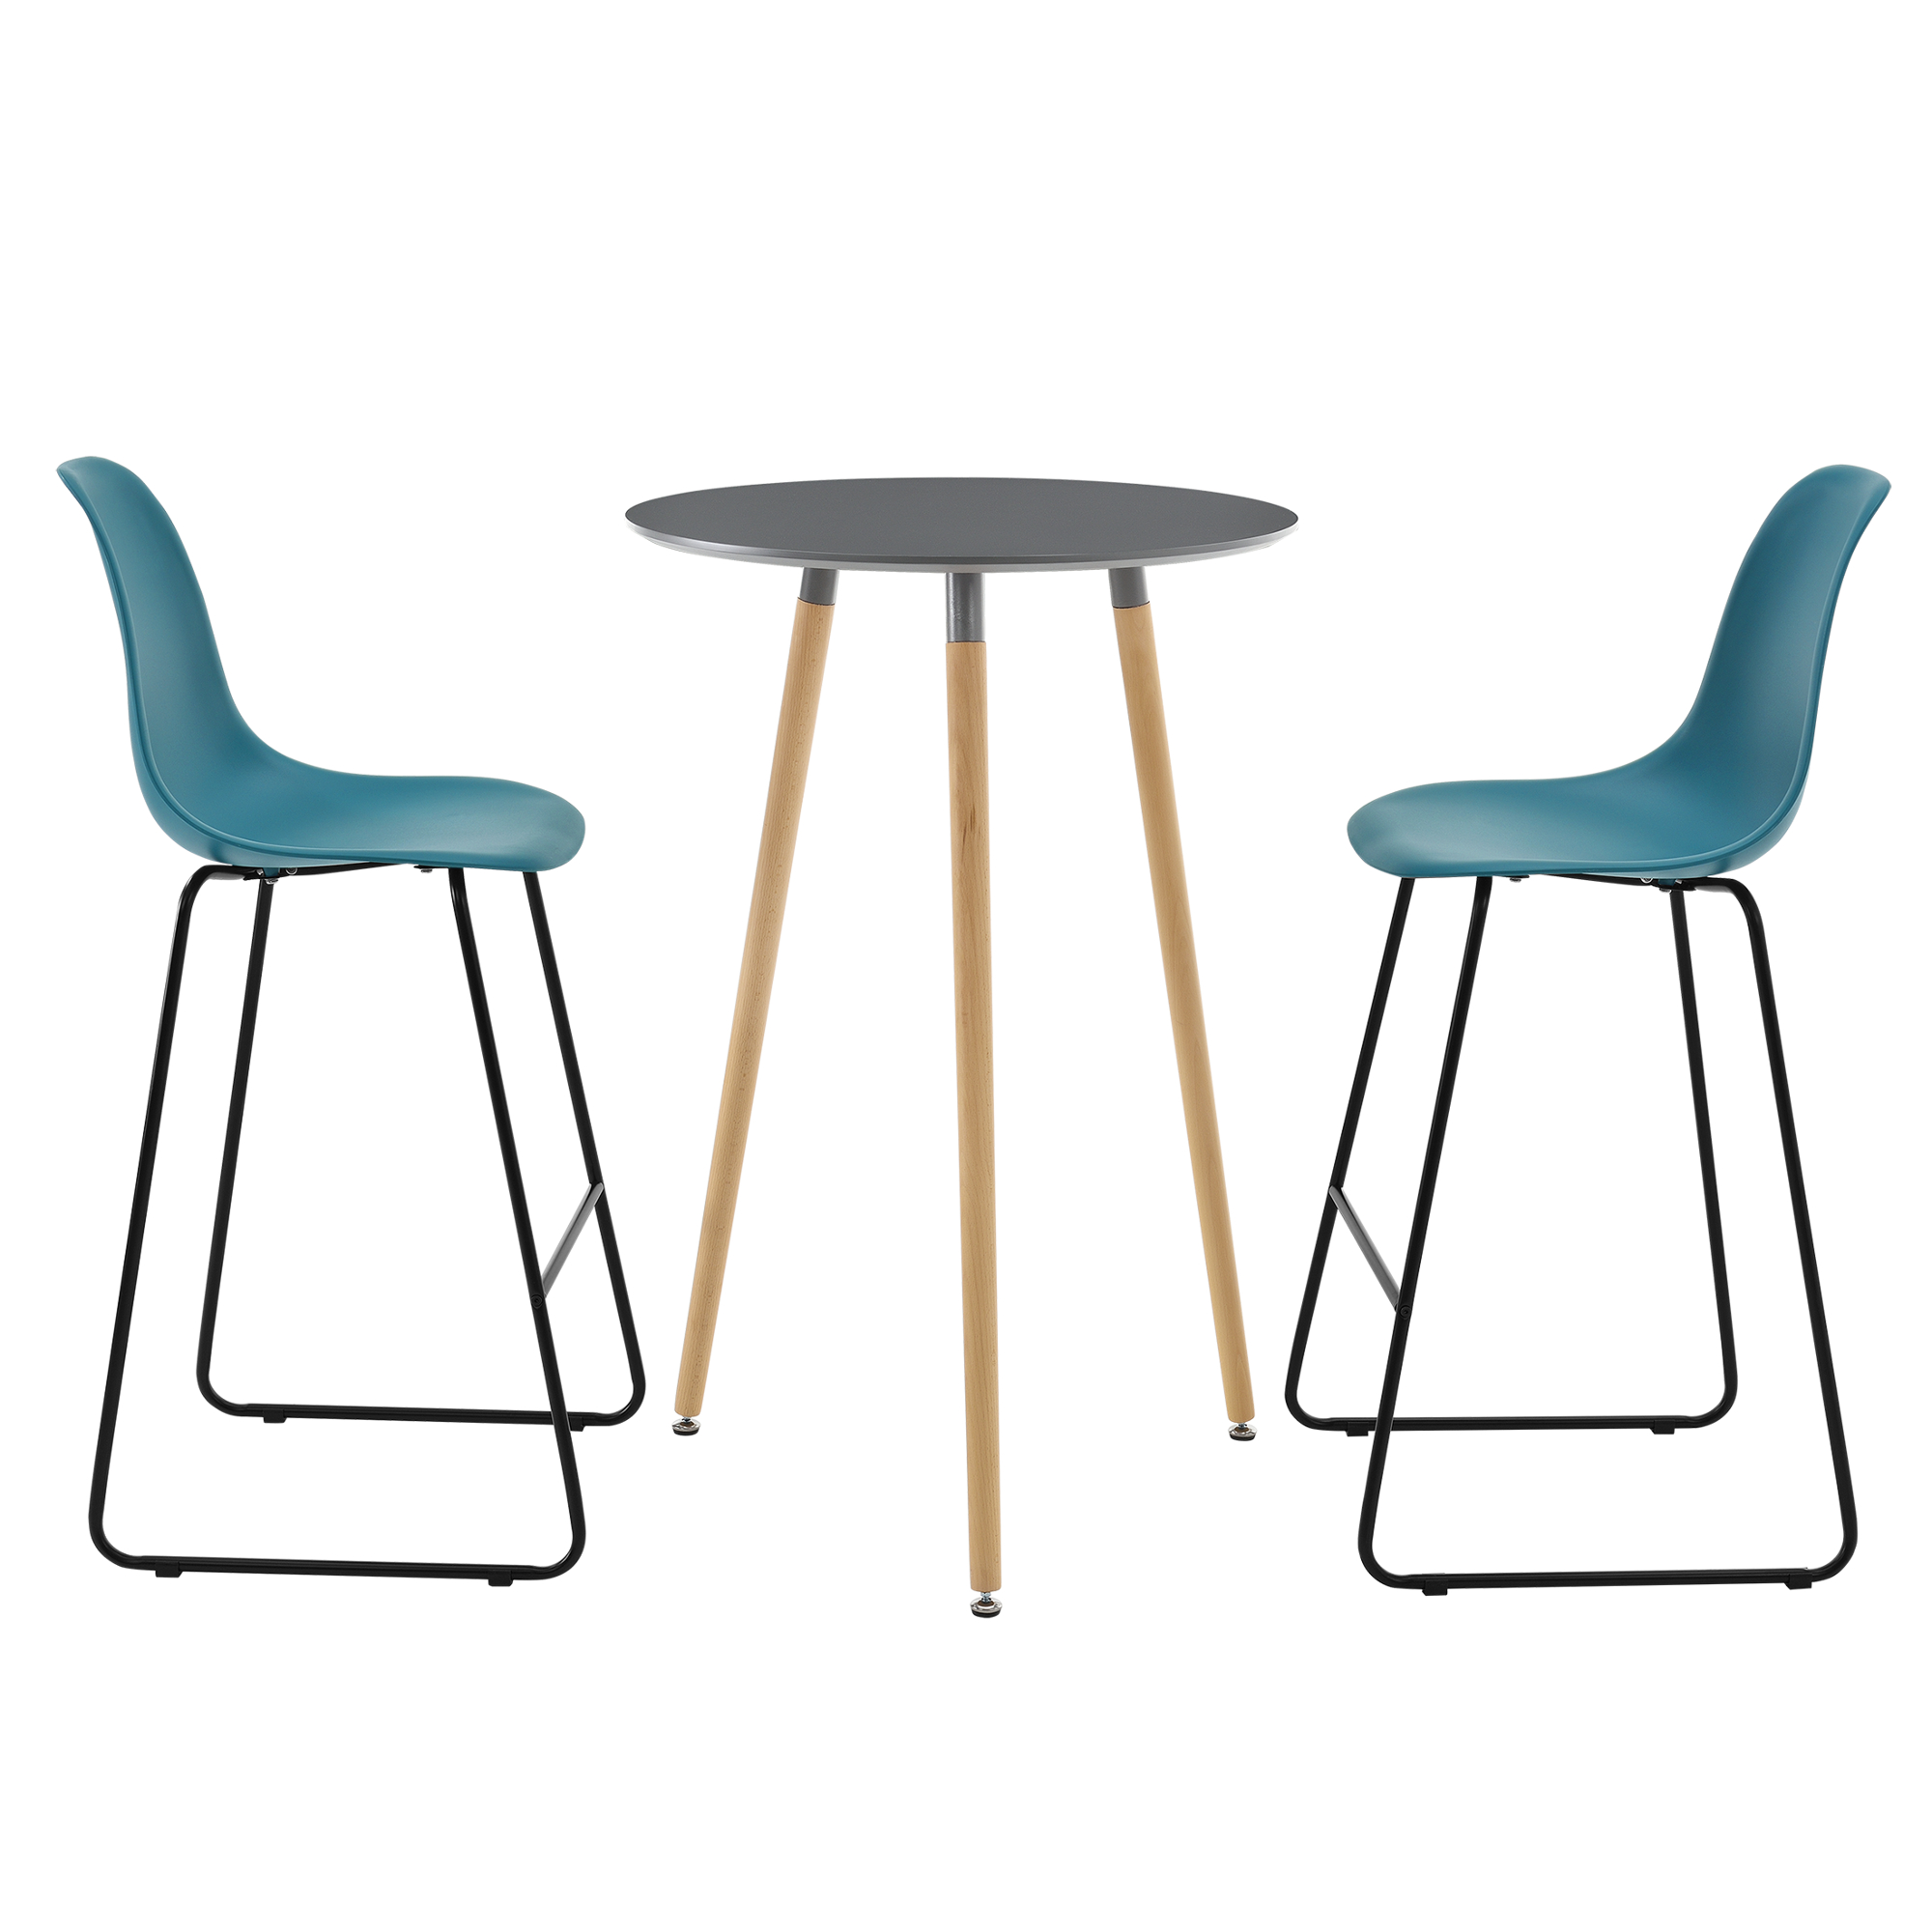 bartisch grau barhocker barhockerset bartresen. Black Bedroom Furniture Sets. Home Design Ideas